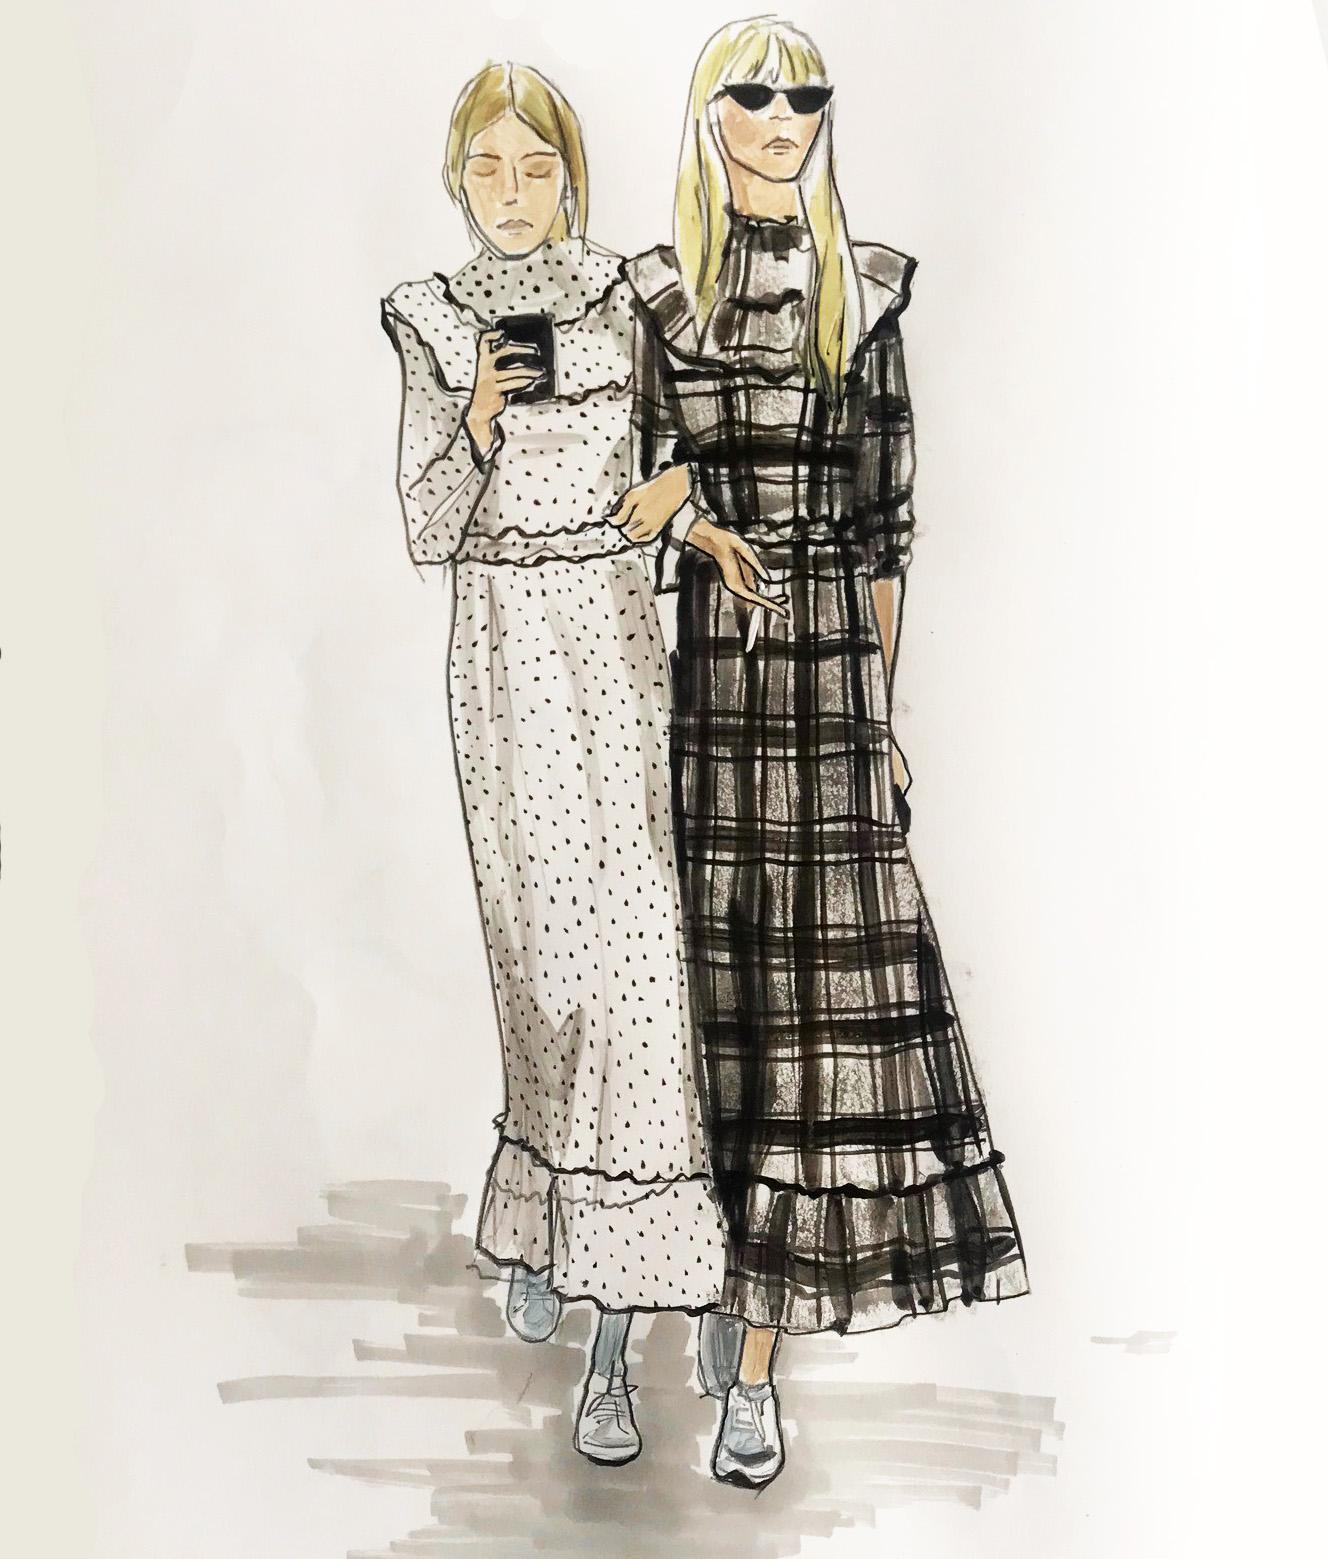 Copenhagen Fashion week sketch - selfish wardrobe.jpg